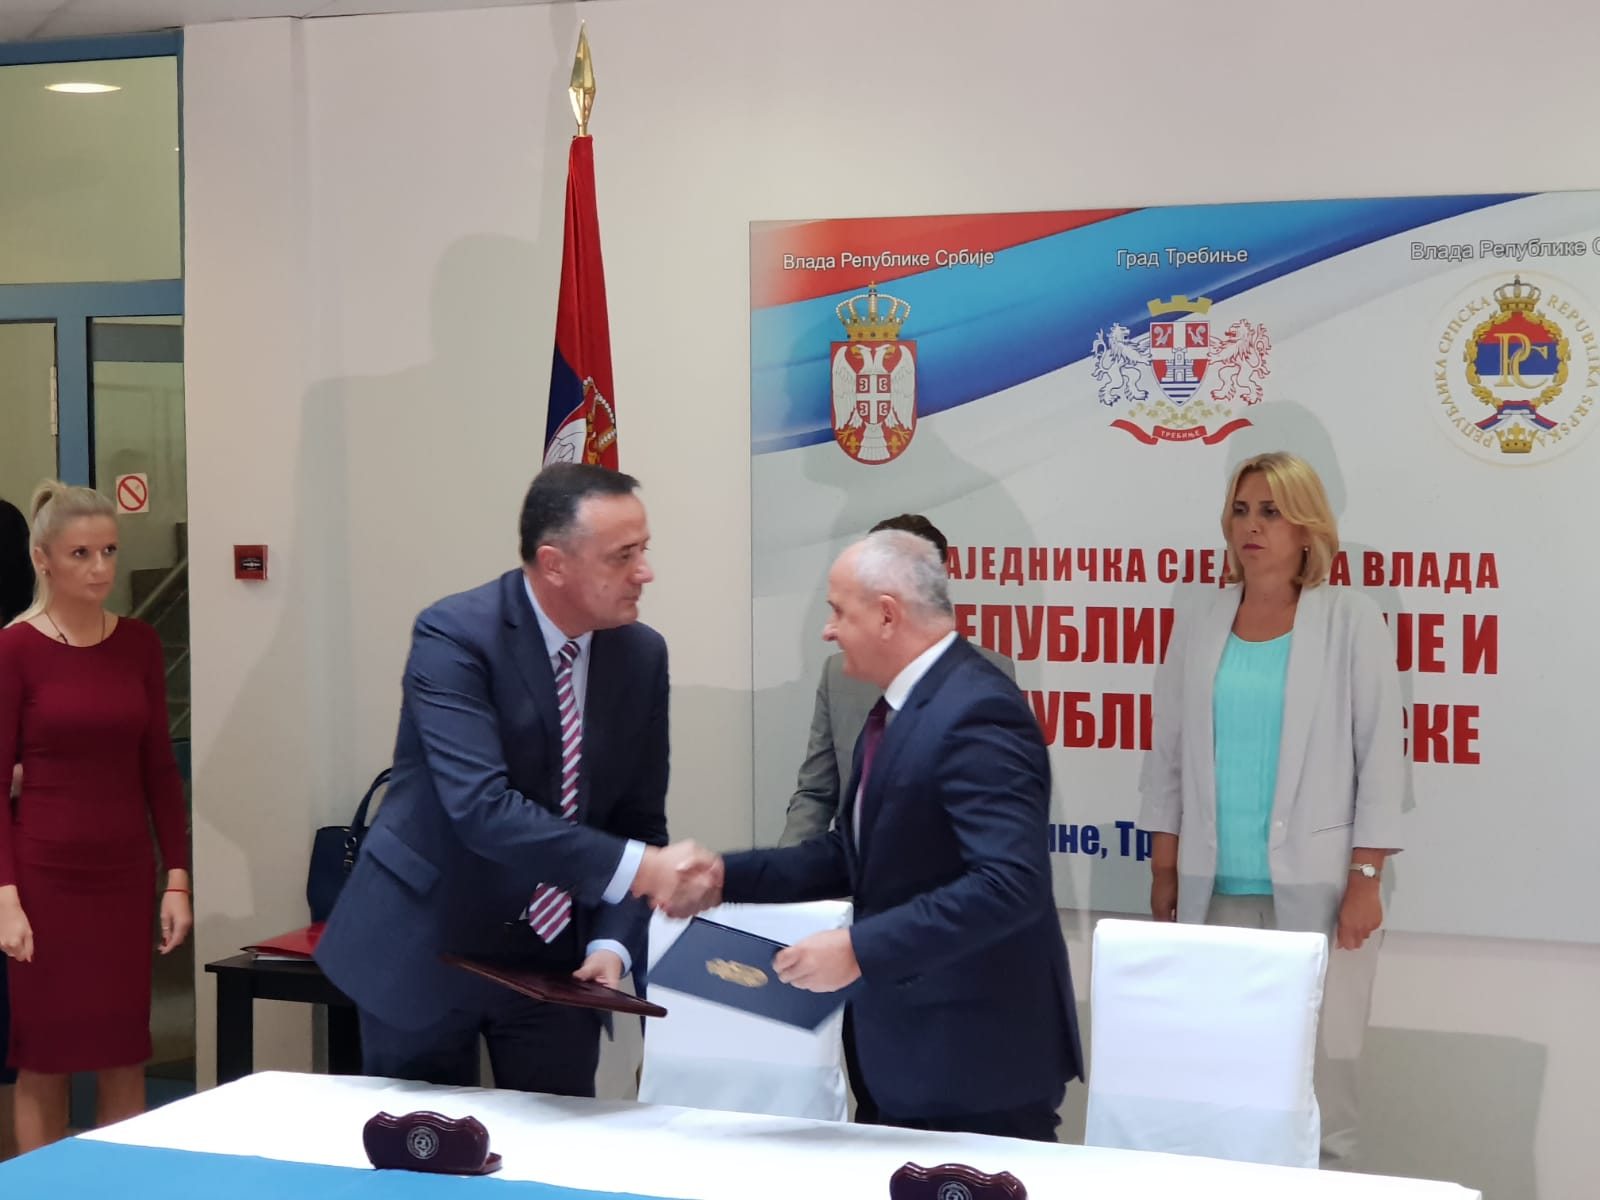 Ministri energetike Republike Srbije i Republike Srpske – Aleksandar Antić i Petar Đokić